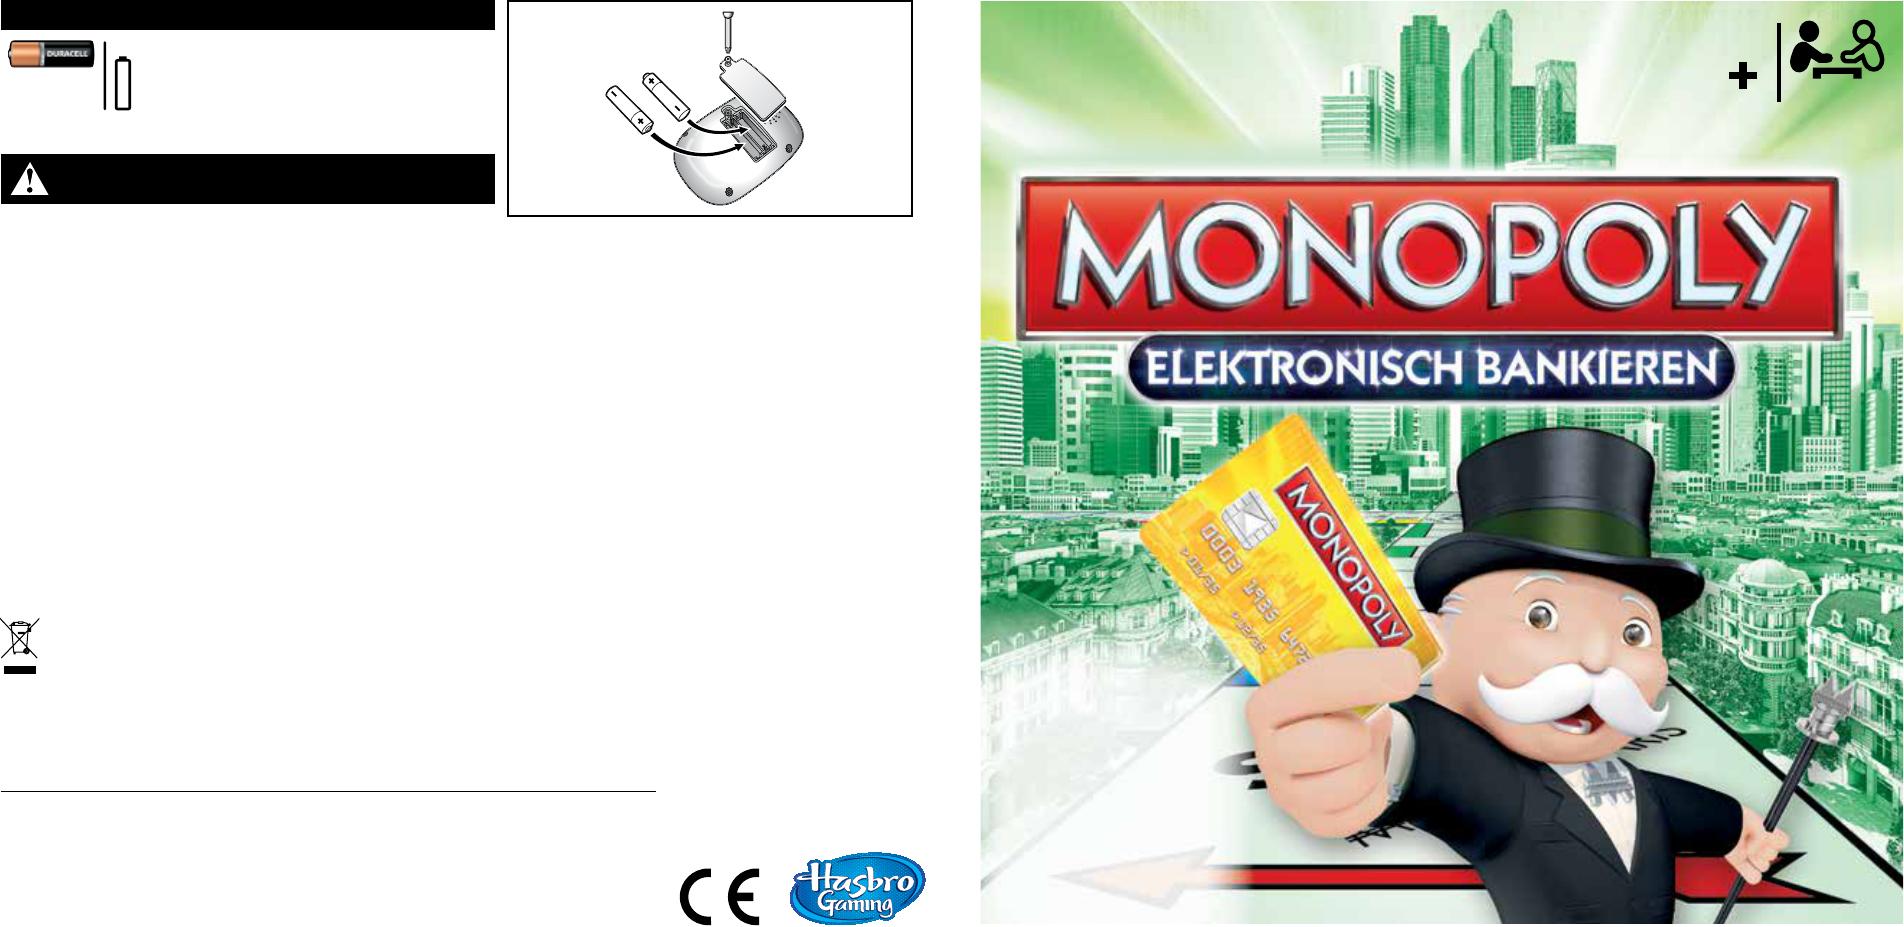 Kartenleser defekt banking monopoly Starten /